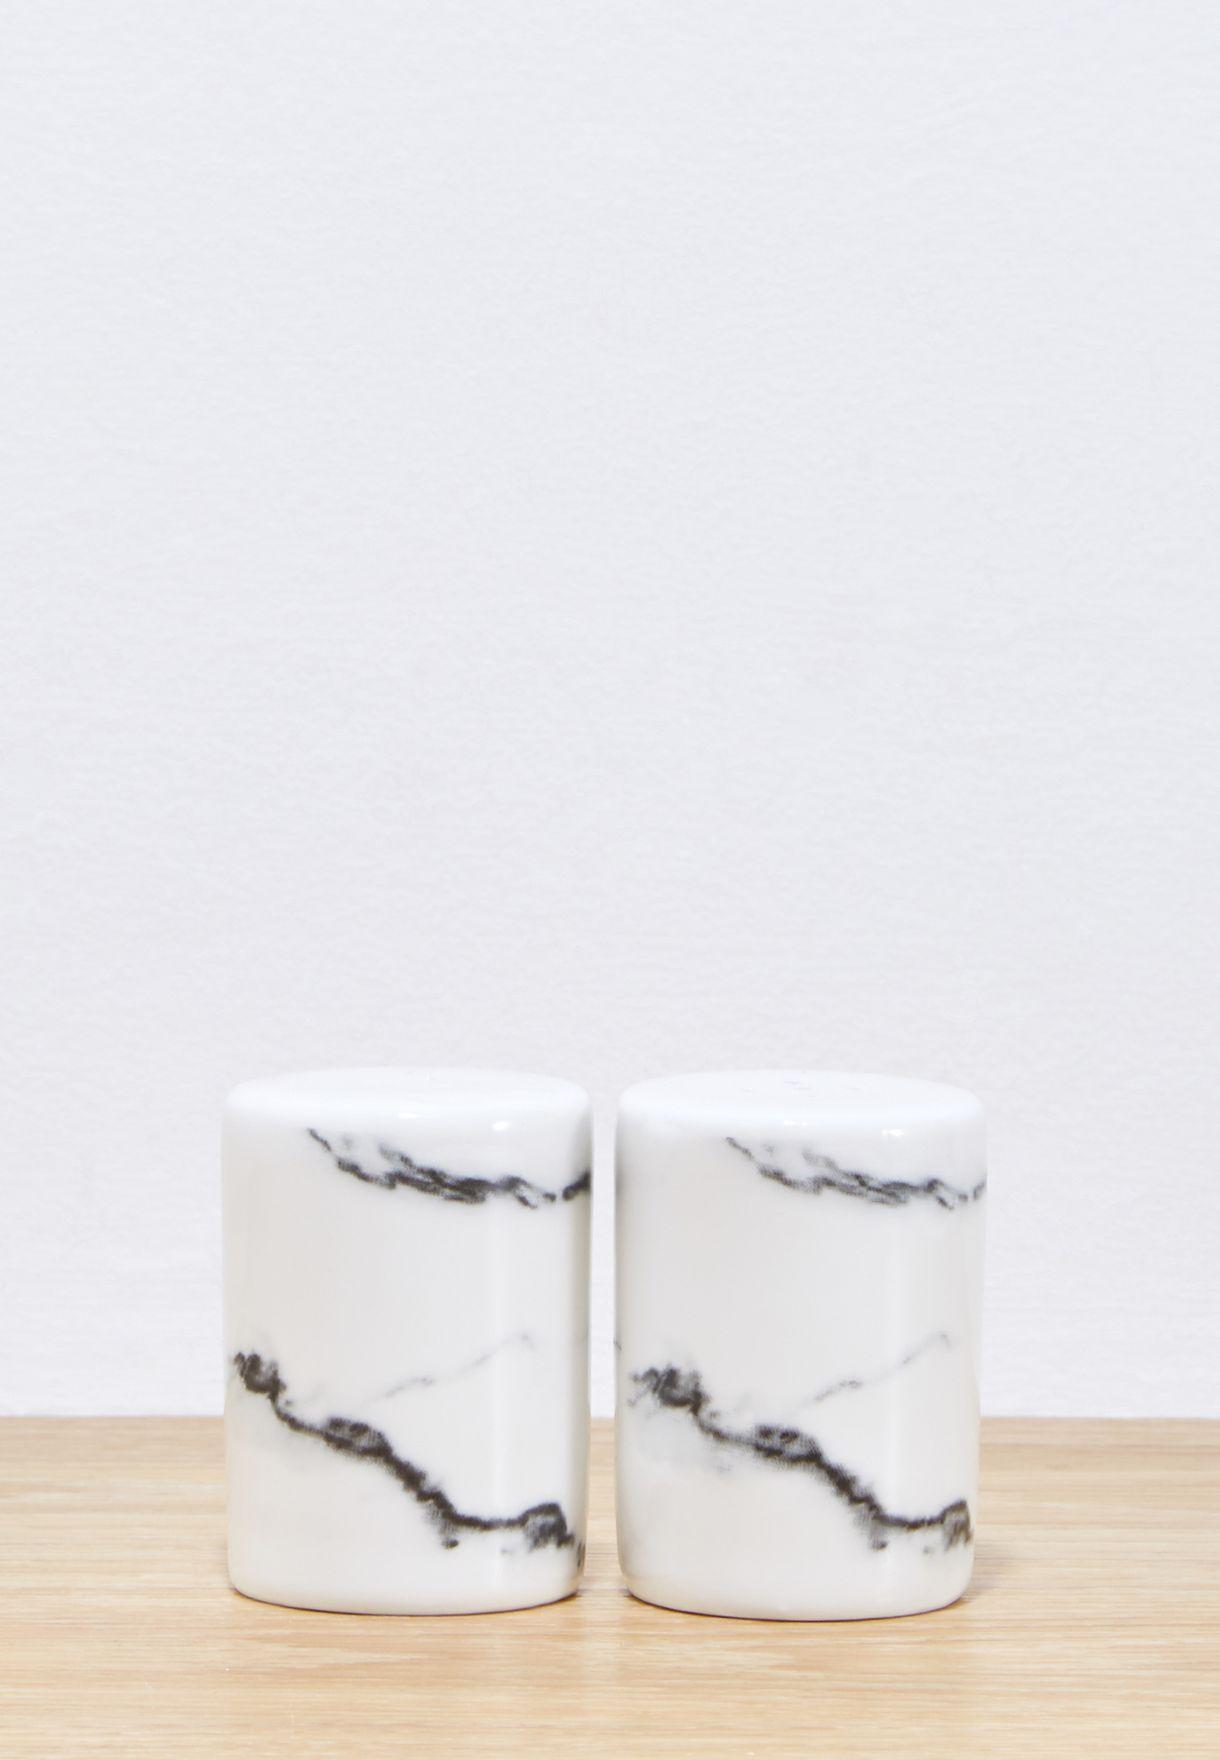 Marbled Salt & Pepper Shaker Set